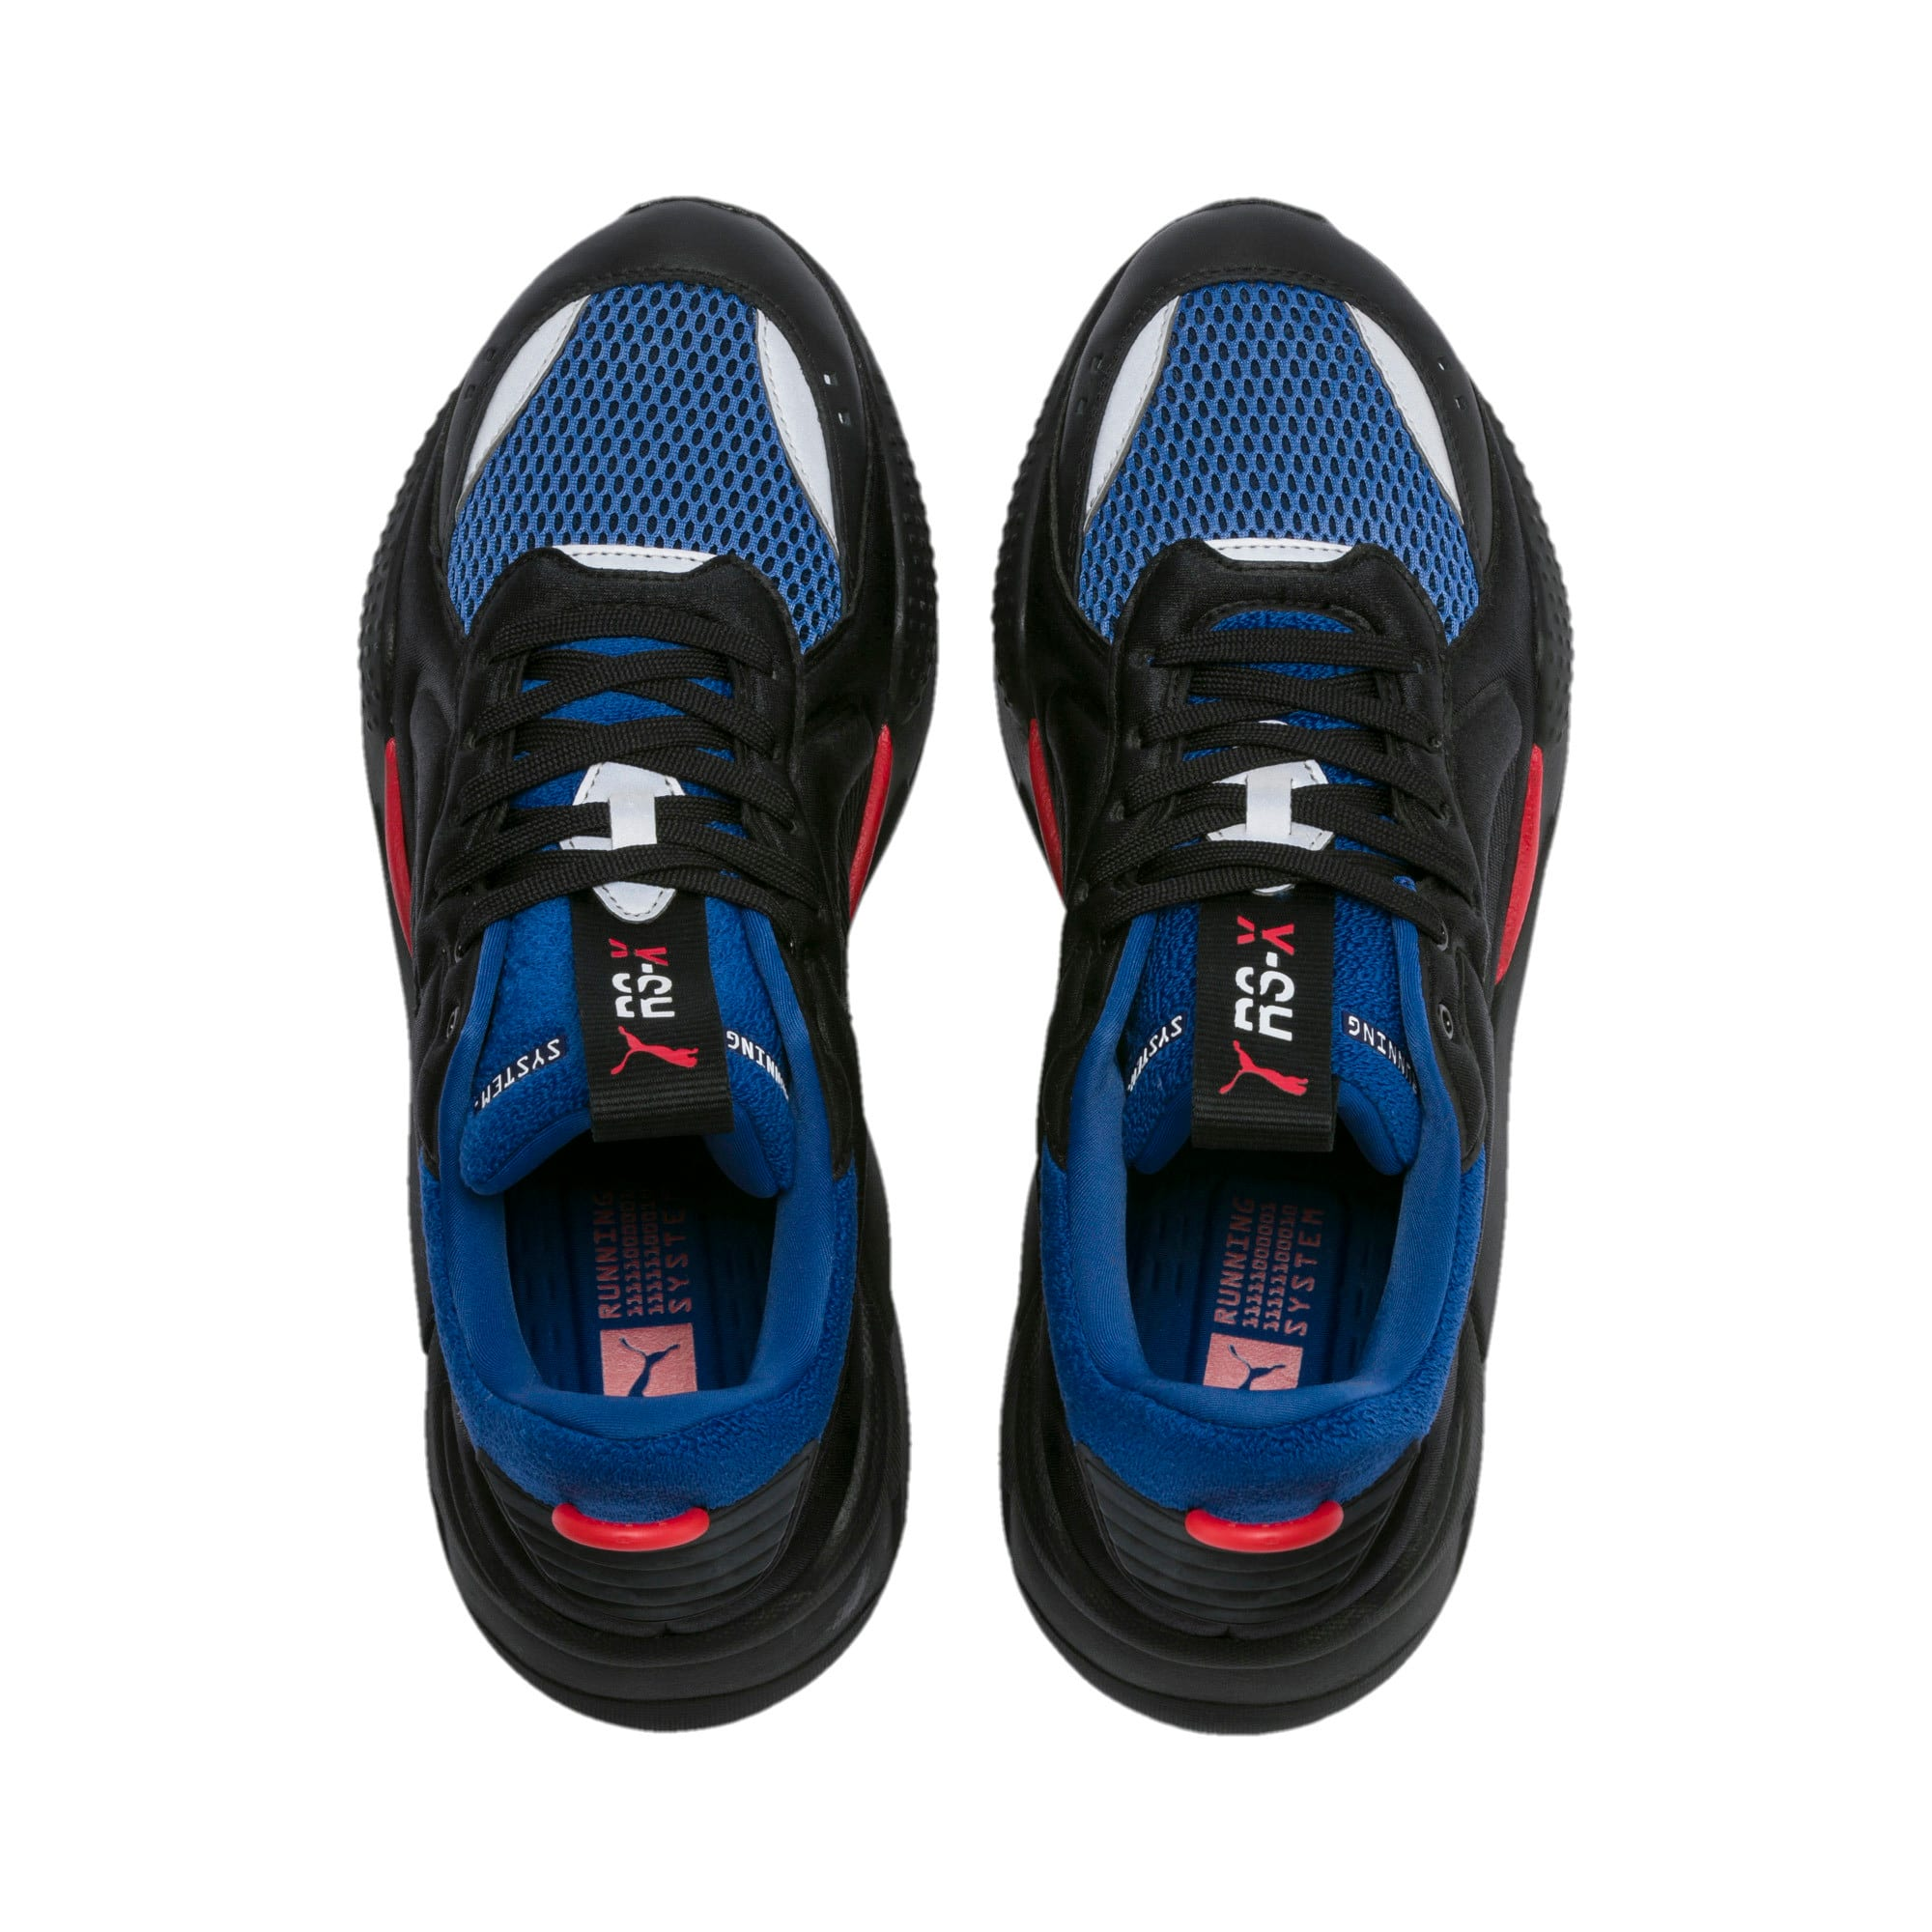 Thumbnail 8 of Basket RS-X Softcase, Puma Black-Galaxy Blue, medium